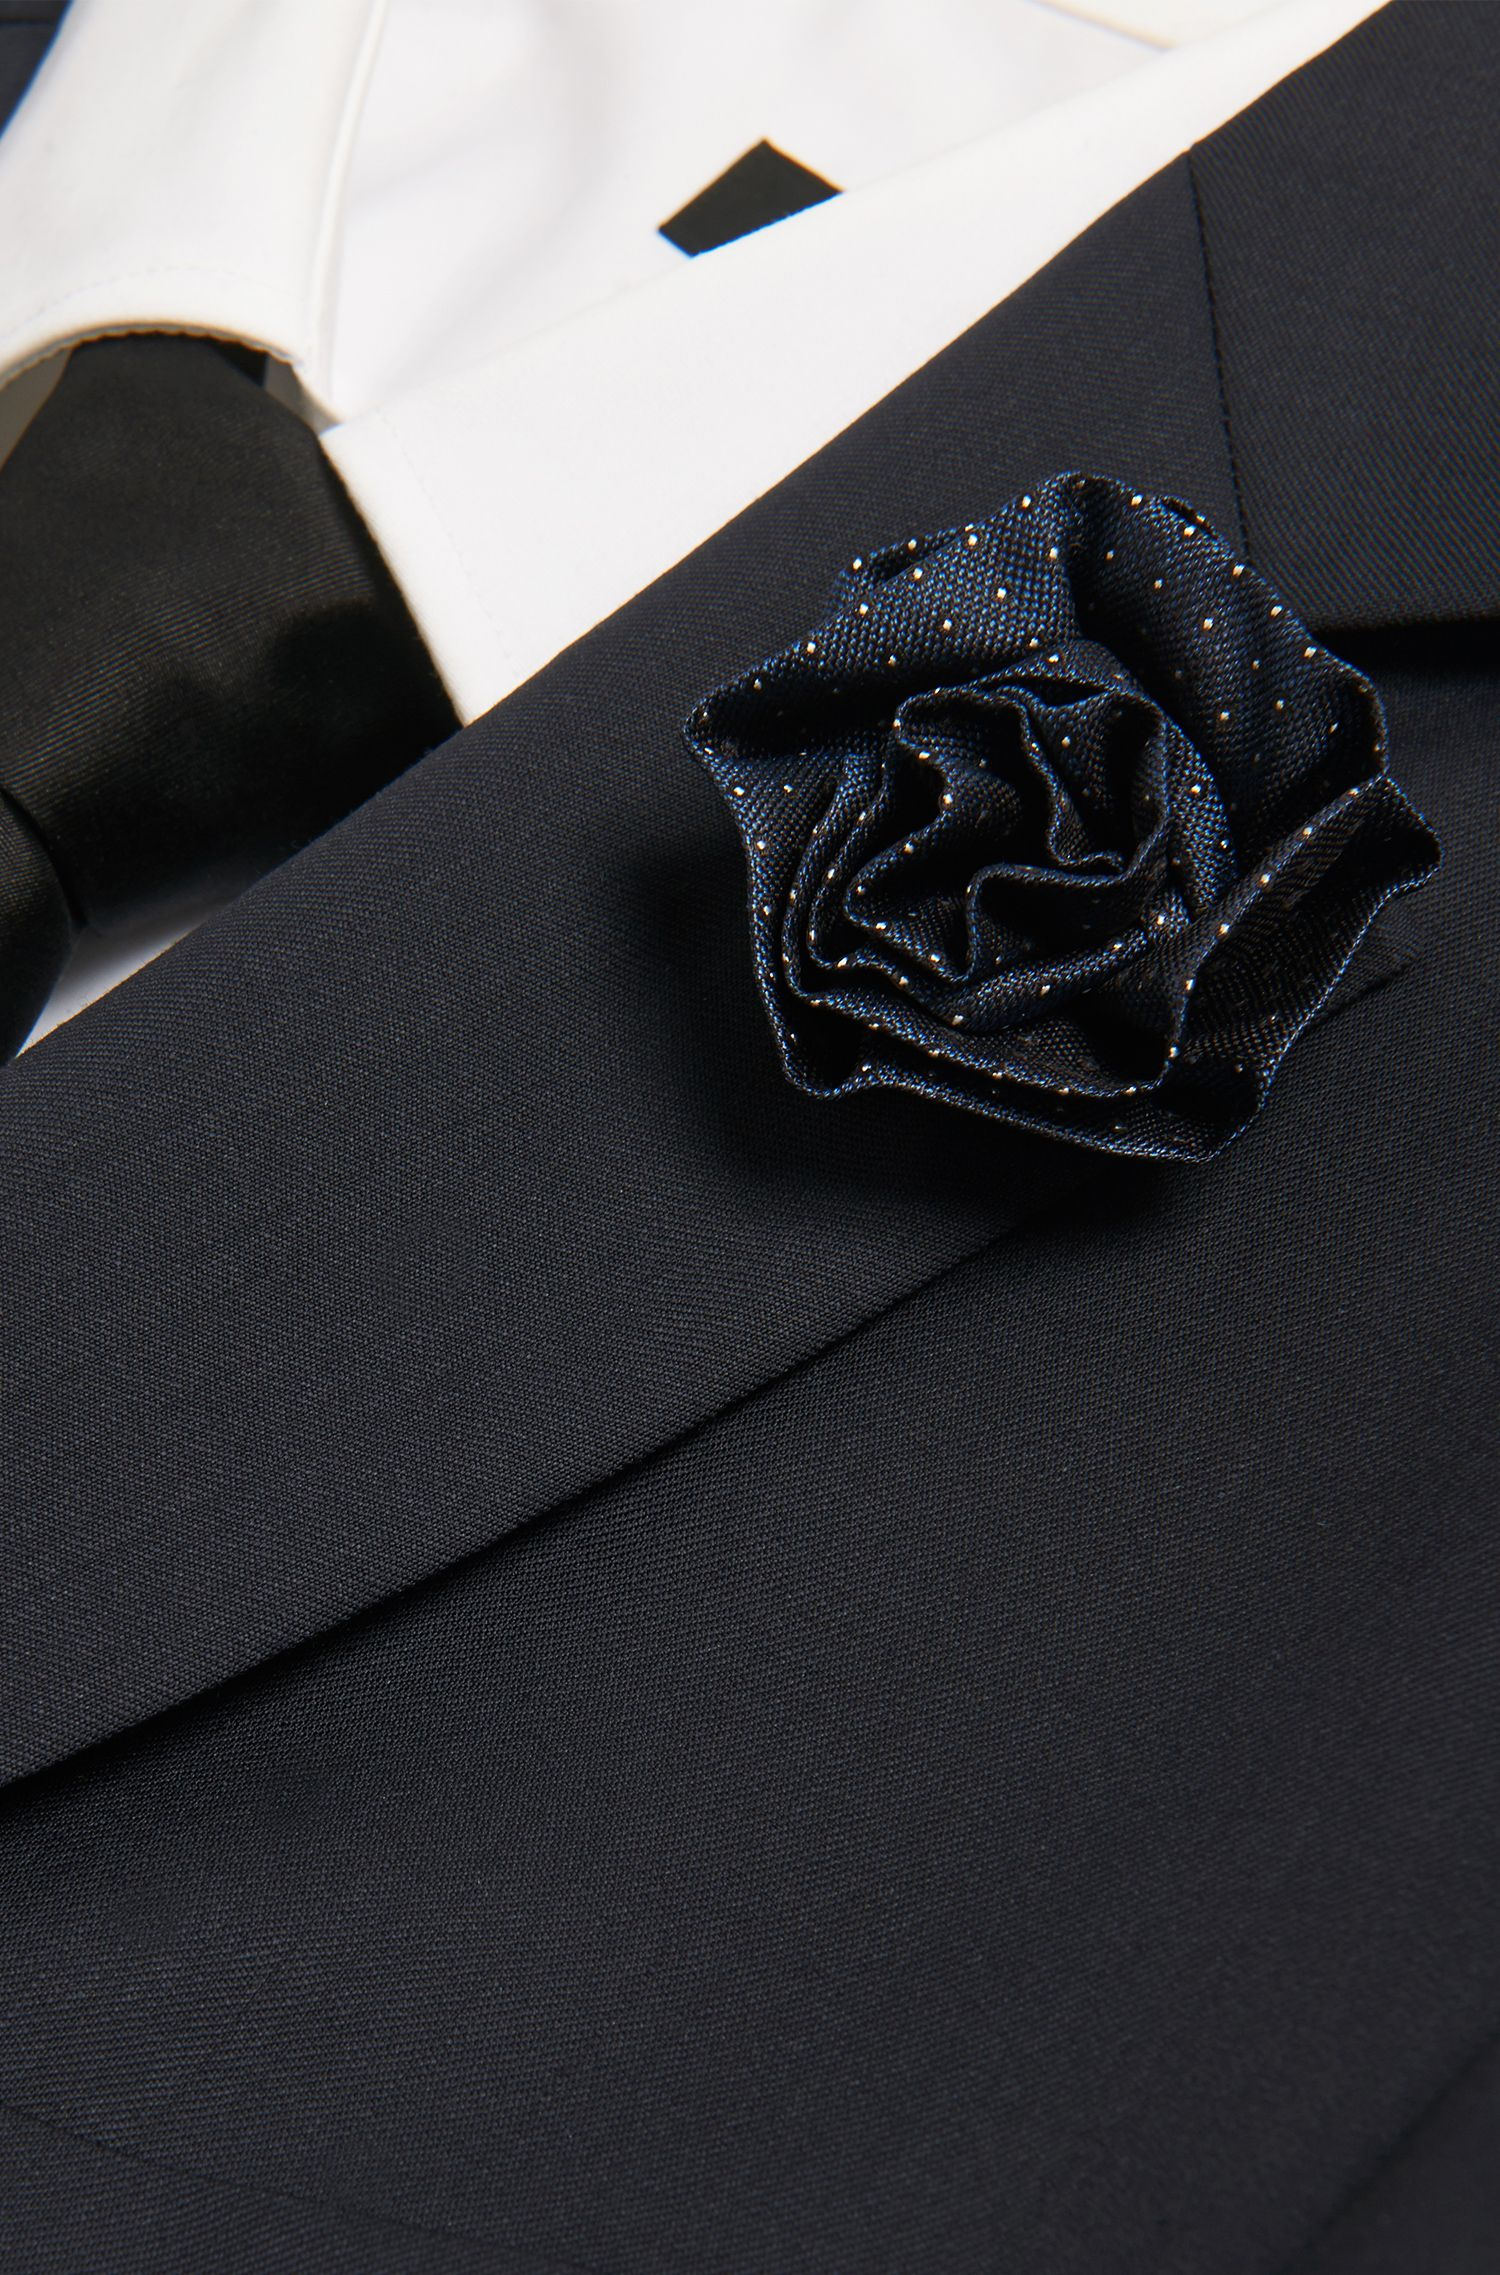 Anstecknadel aus Messing mit Seidenblüte: 'Silk brooch'